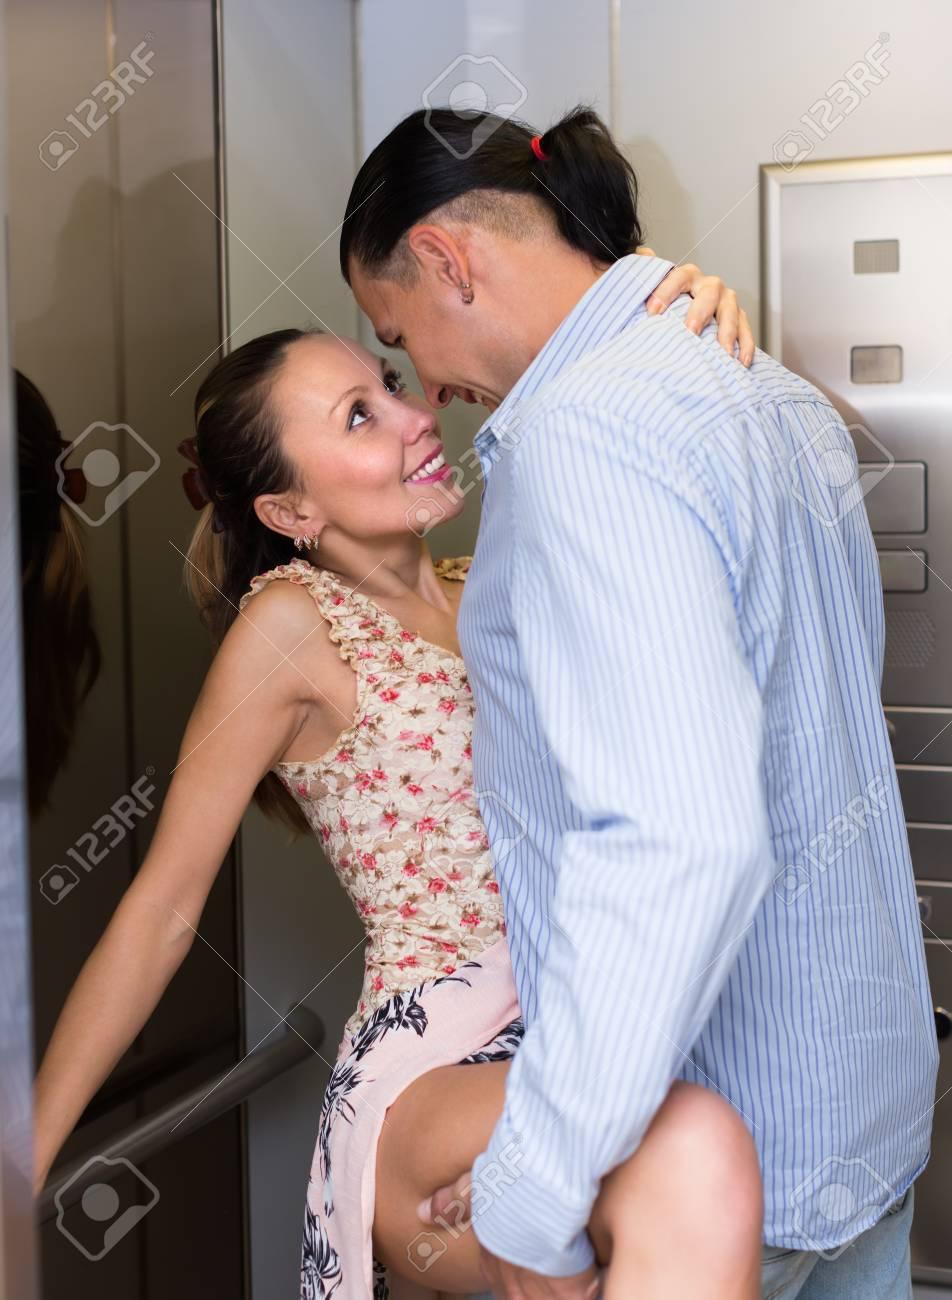 Impatient adult couple having at elevator - 34628456